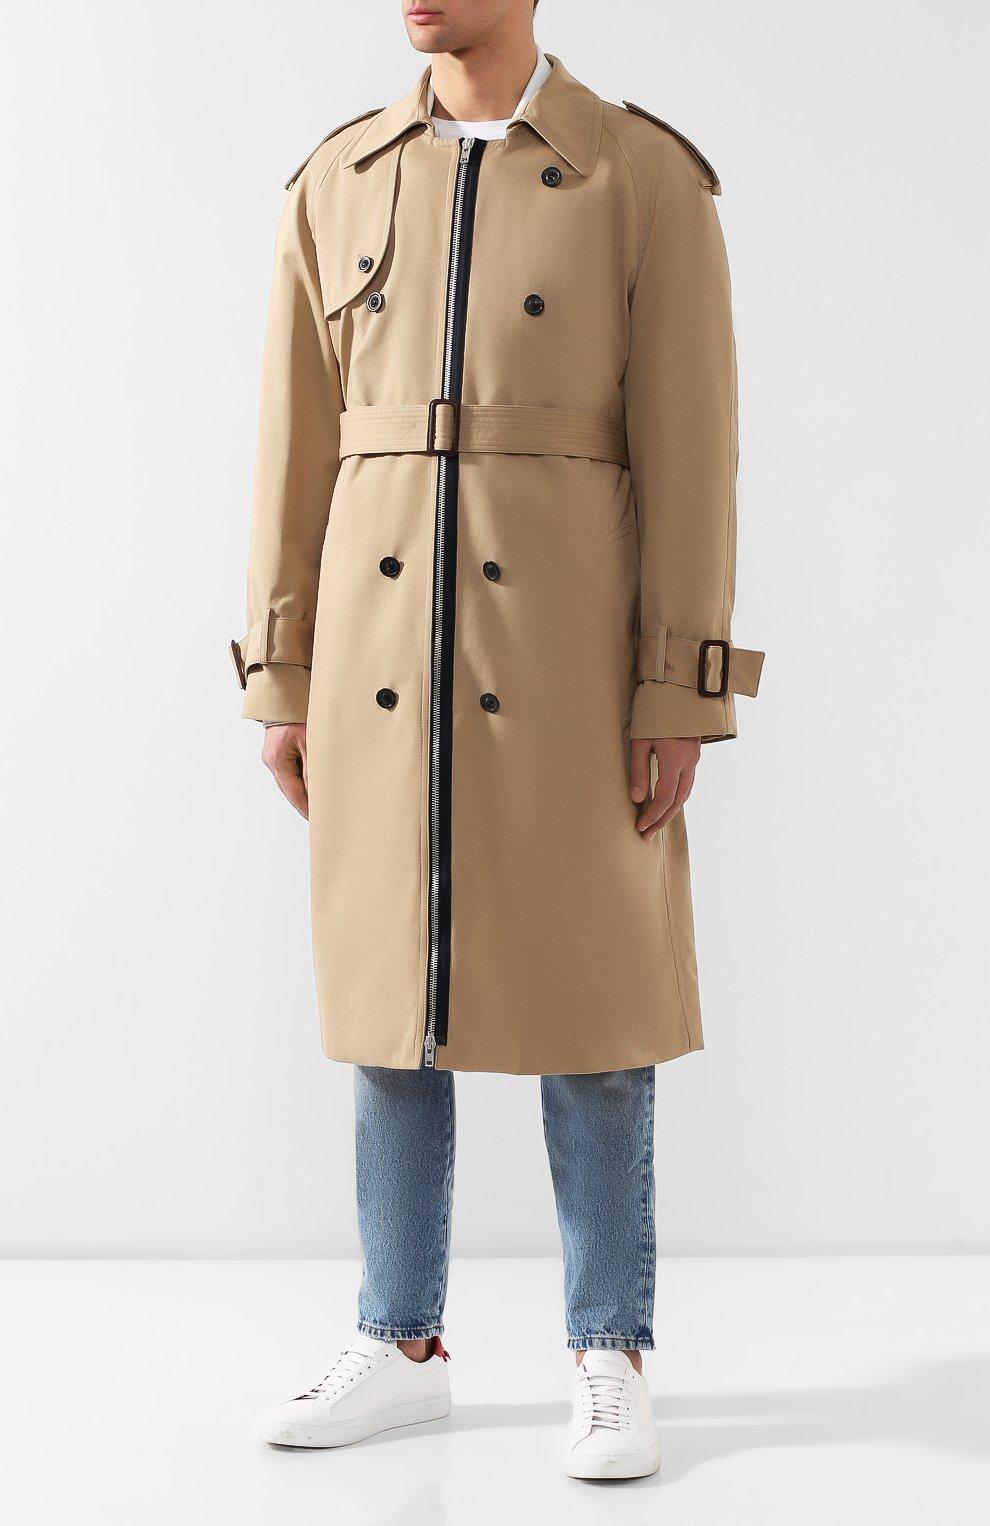 Комплект из плаща и куртки Maison Margiela бежевого цвета | Фото №3